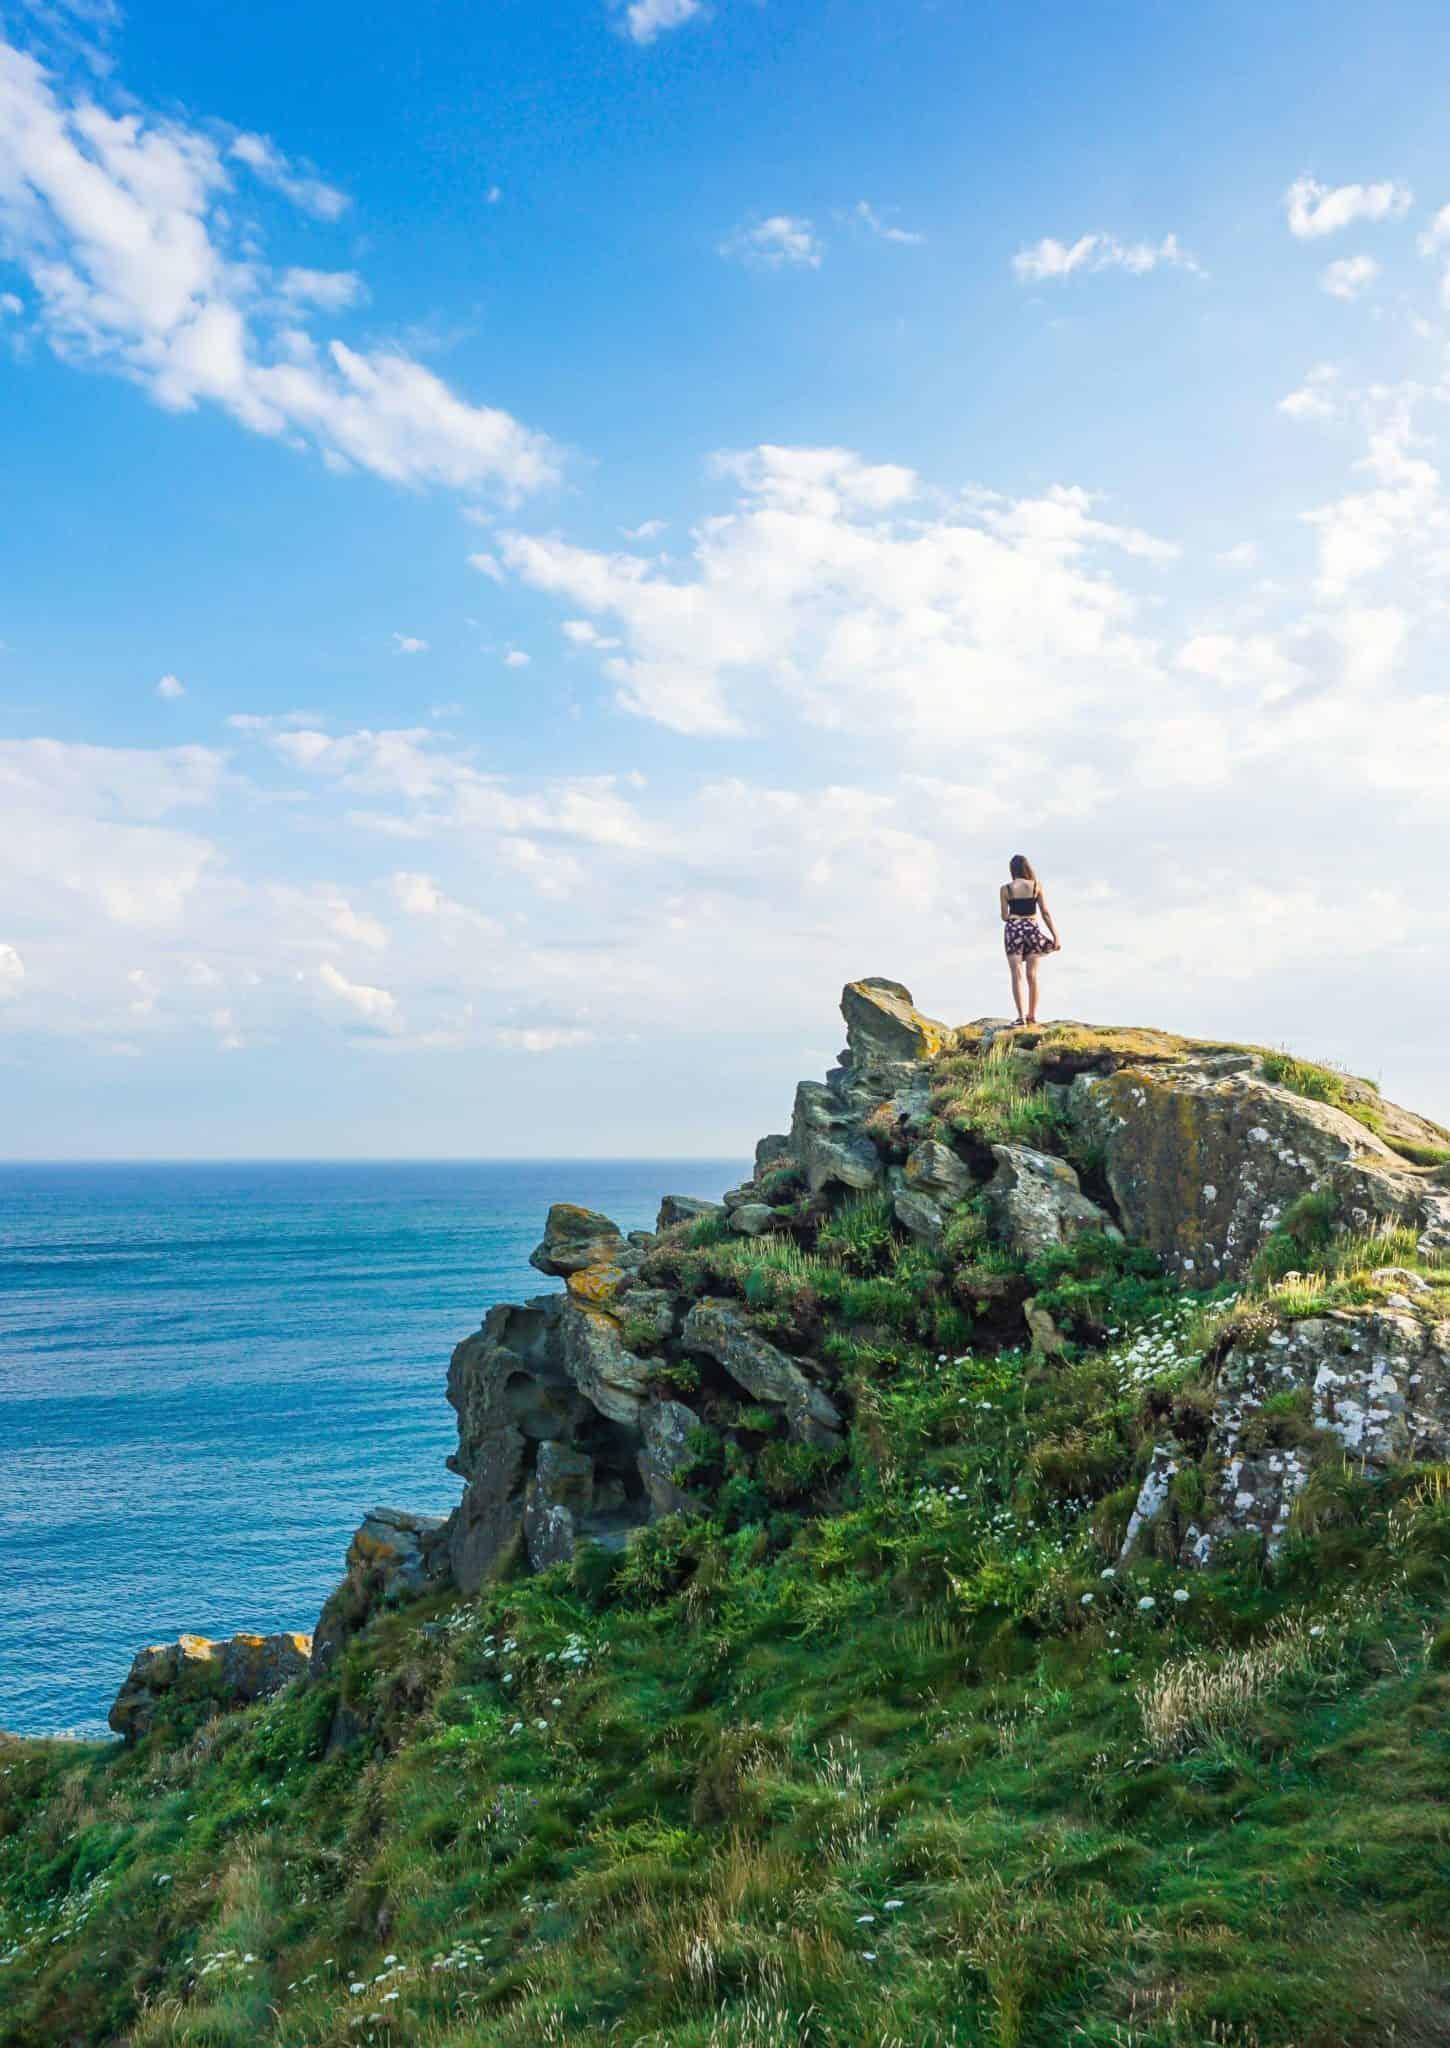 Guide to east Prawle and East Portlemouth, South Hams, Devon, England: